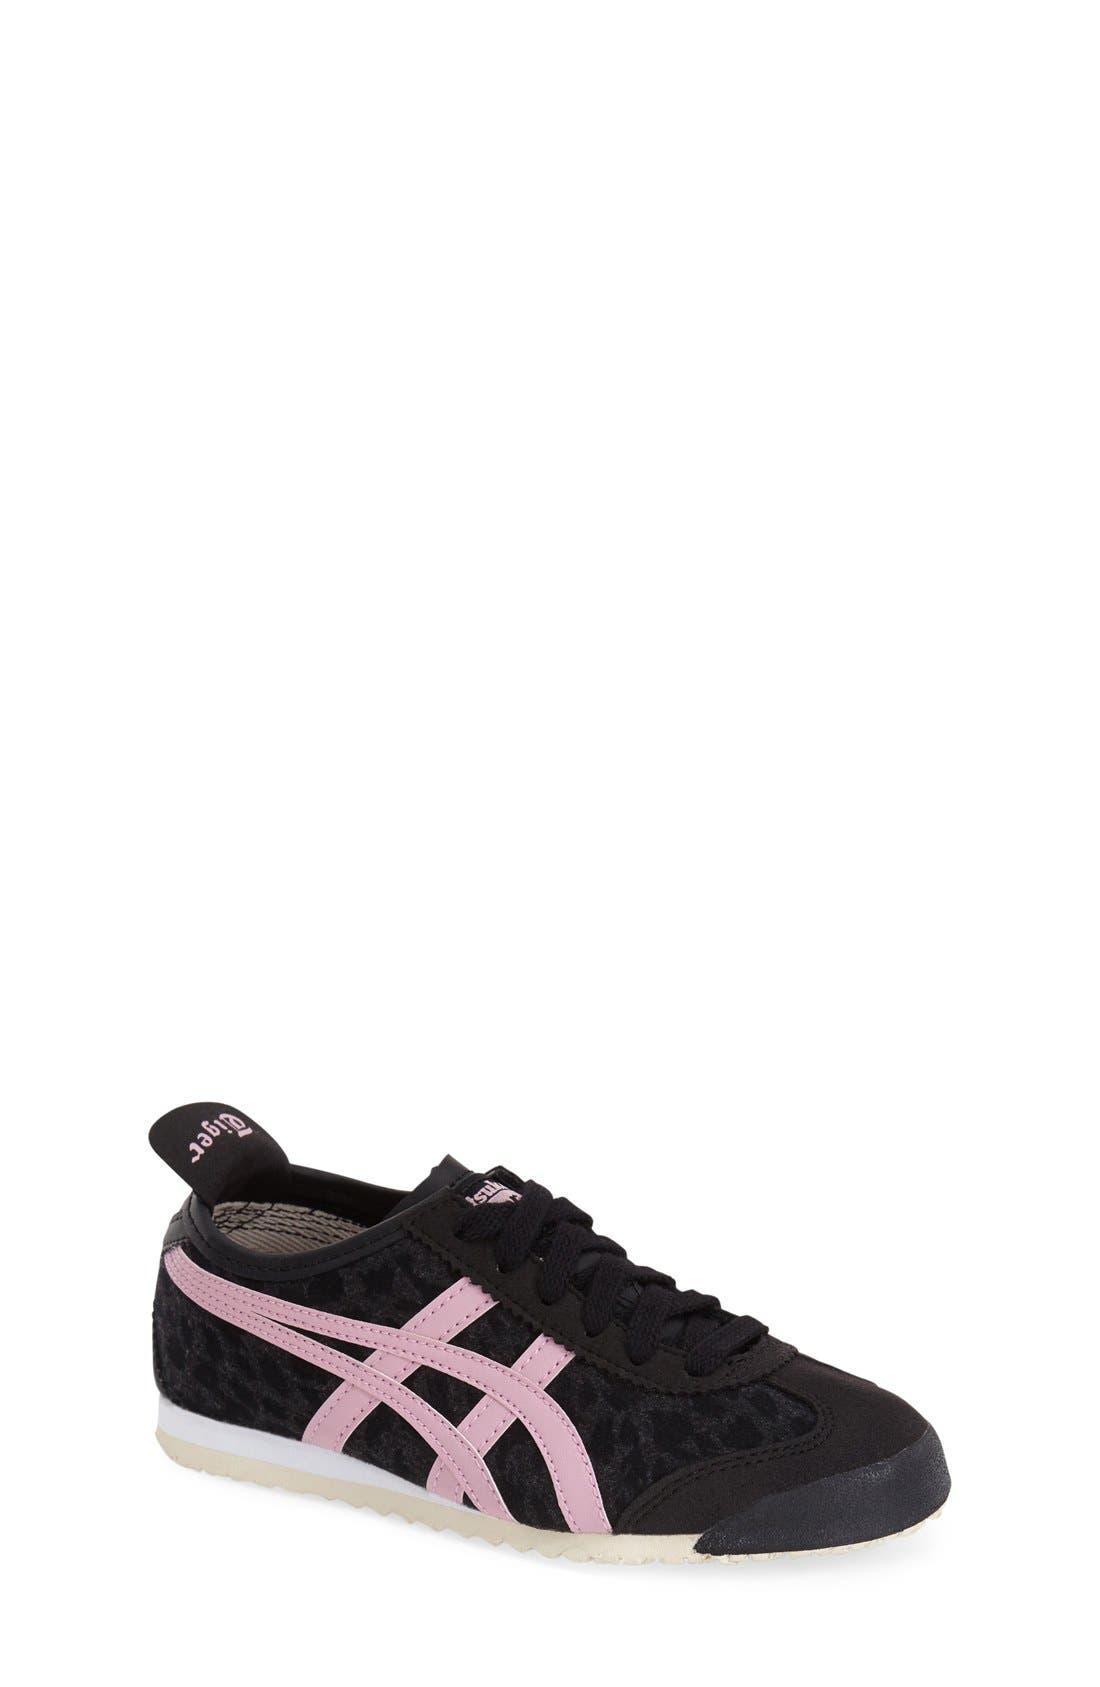 onitsuka tiger mexico 66 black and pink underwear kid